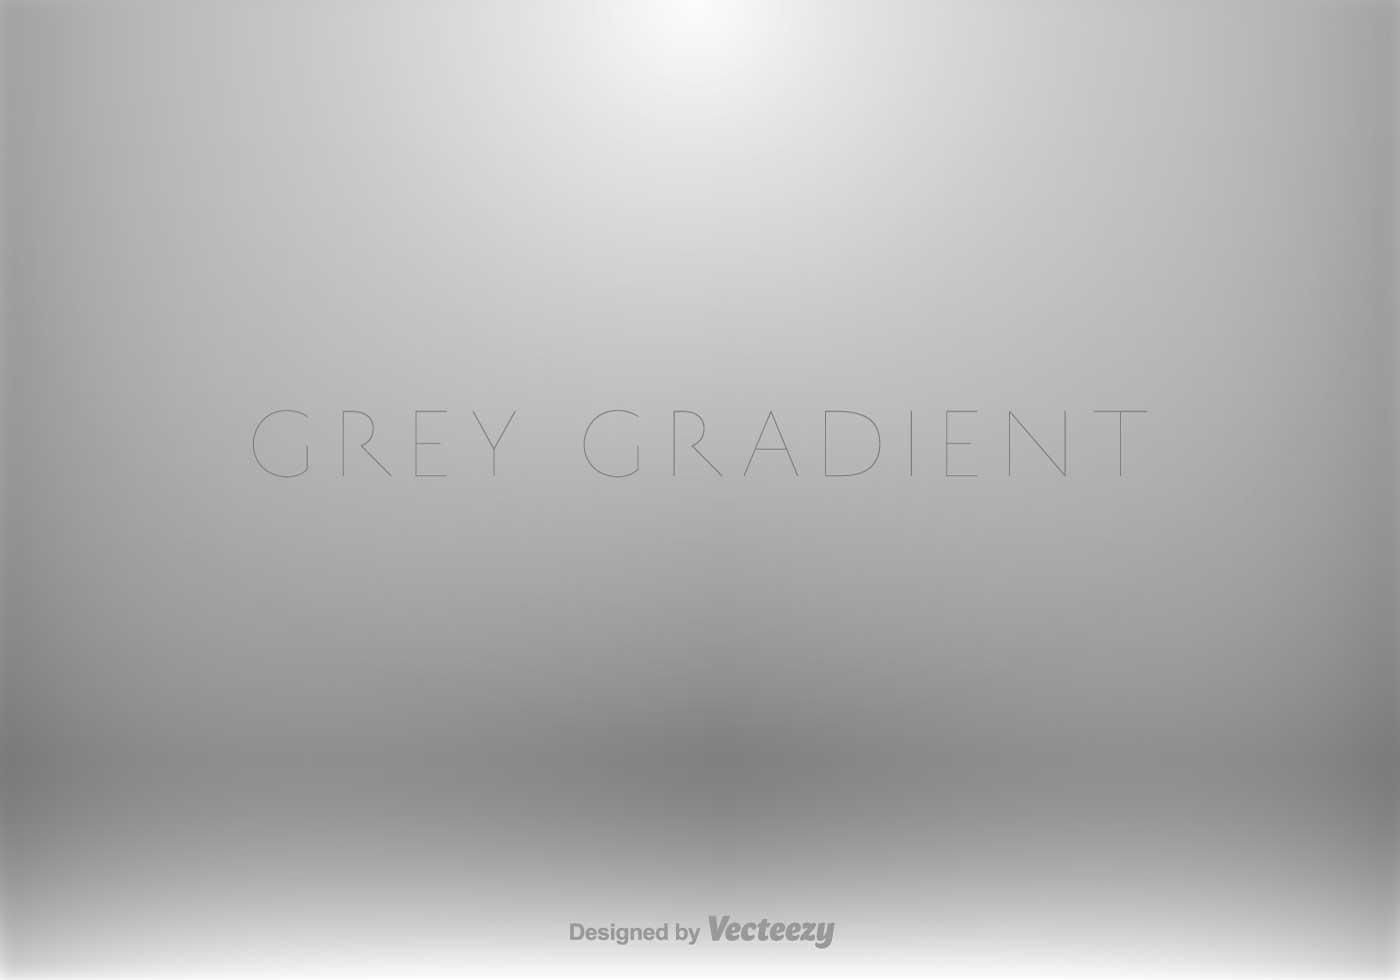 Black Dot Wallpaper Grey Gradient Free Vector Art 2096 Free Downloads